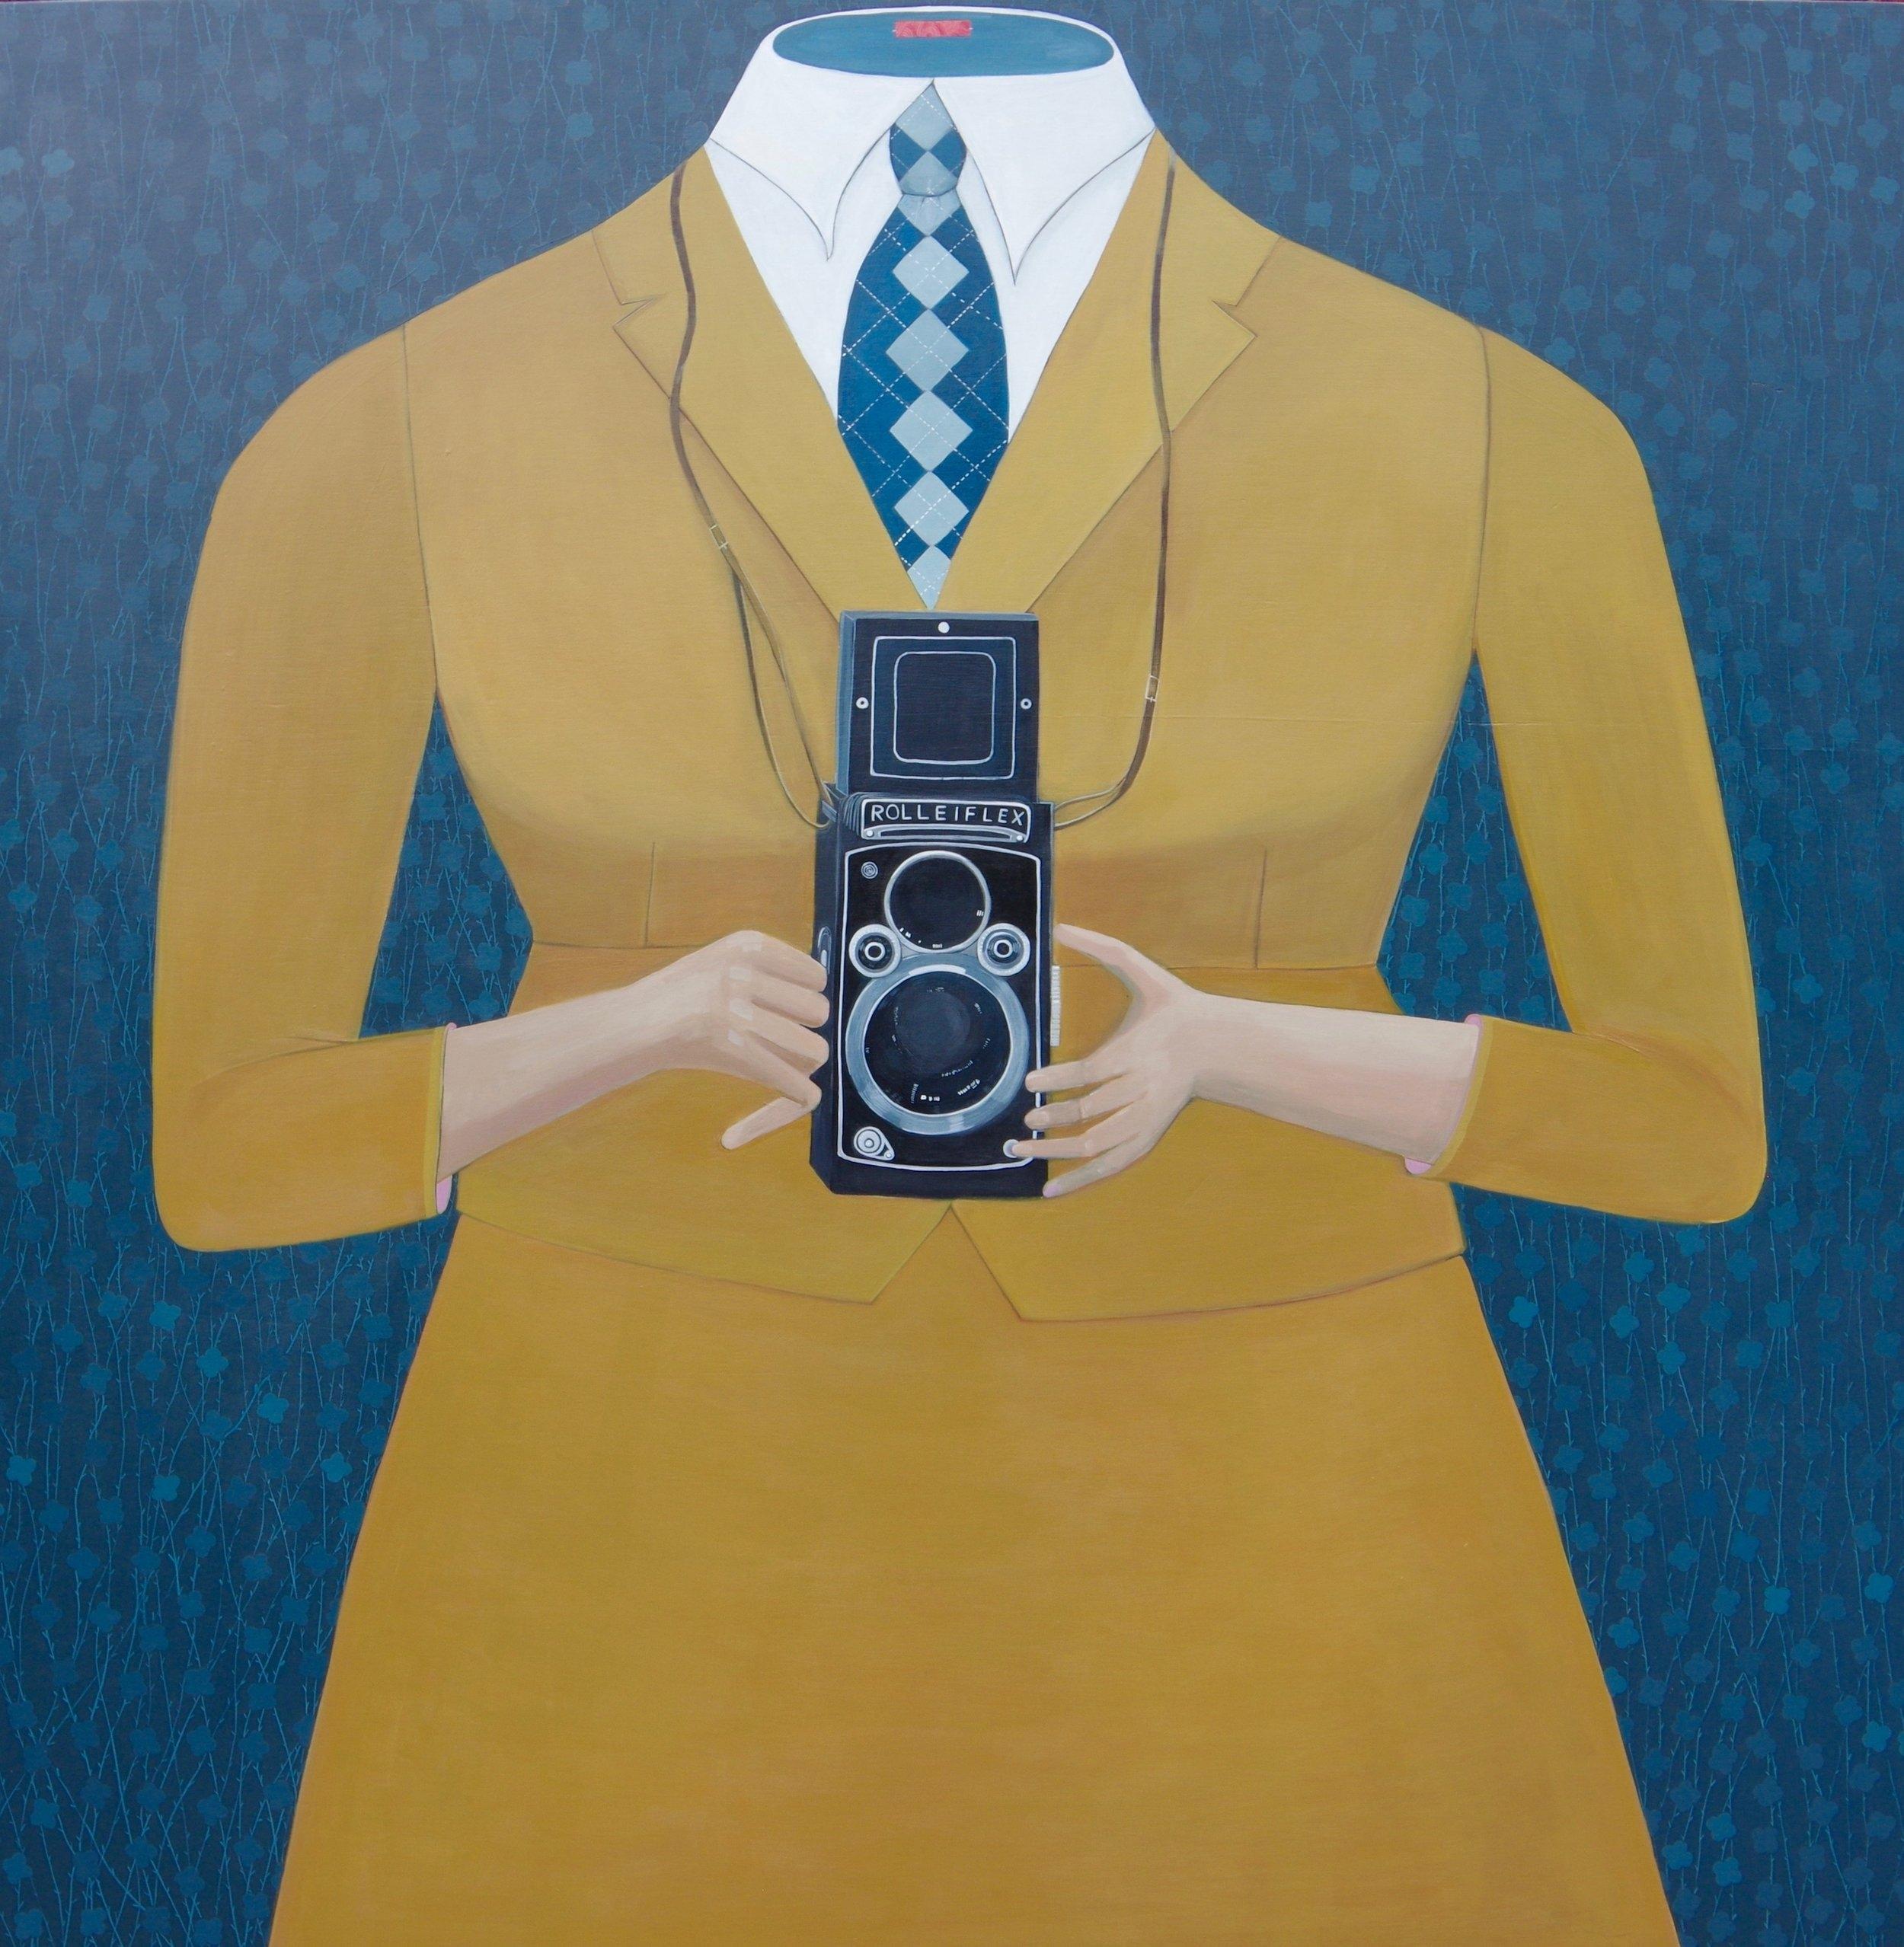 Headless Holding a Rolleiflex Camera   Acrylic on Panel  4'x4'  2018